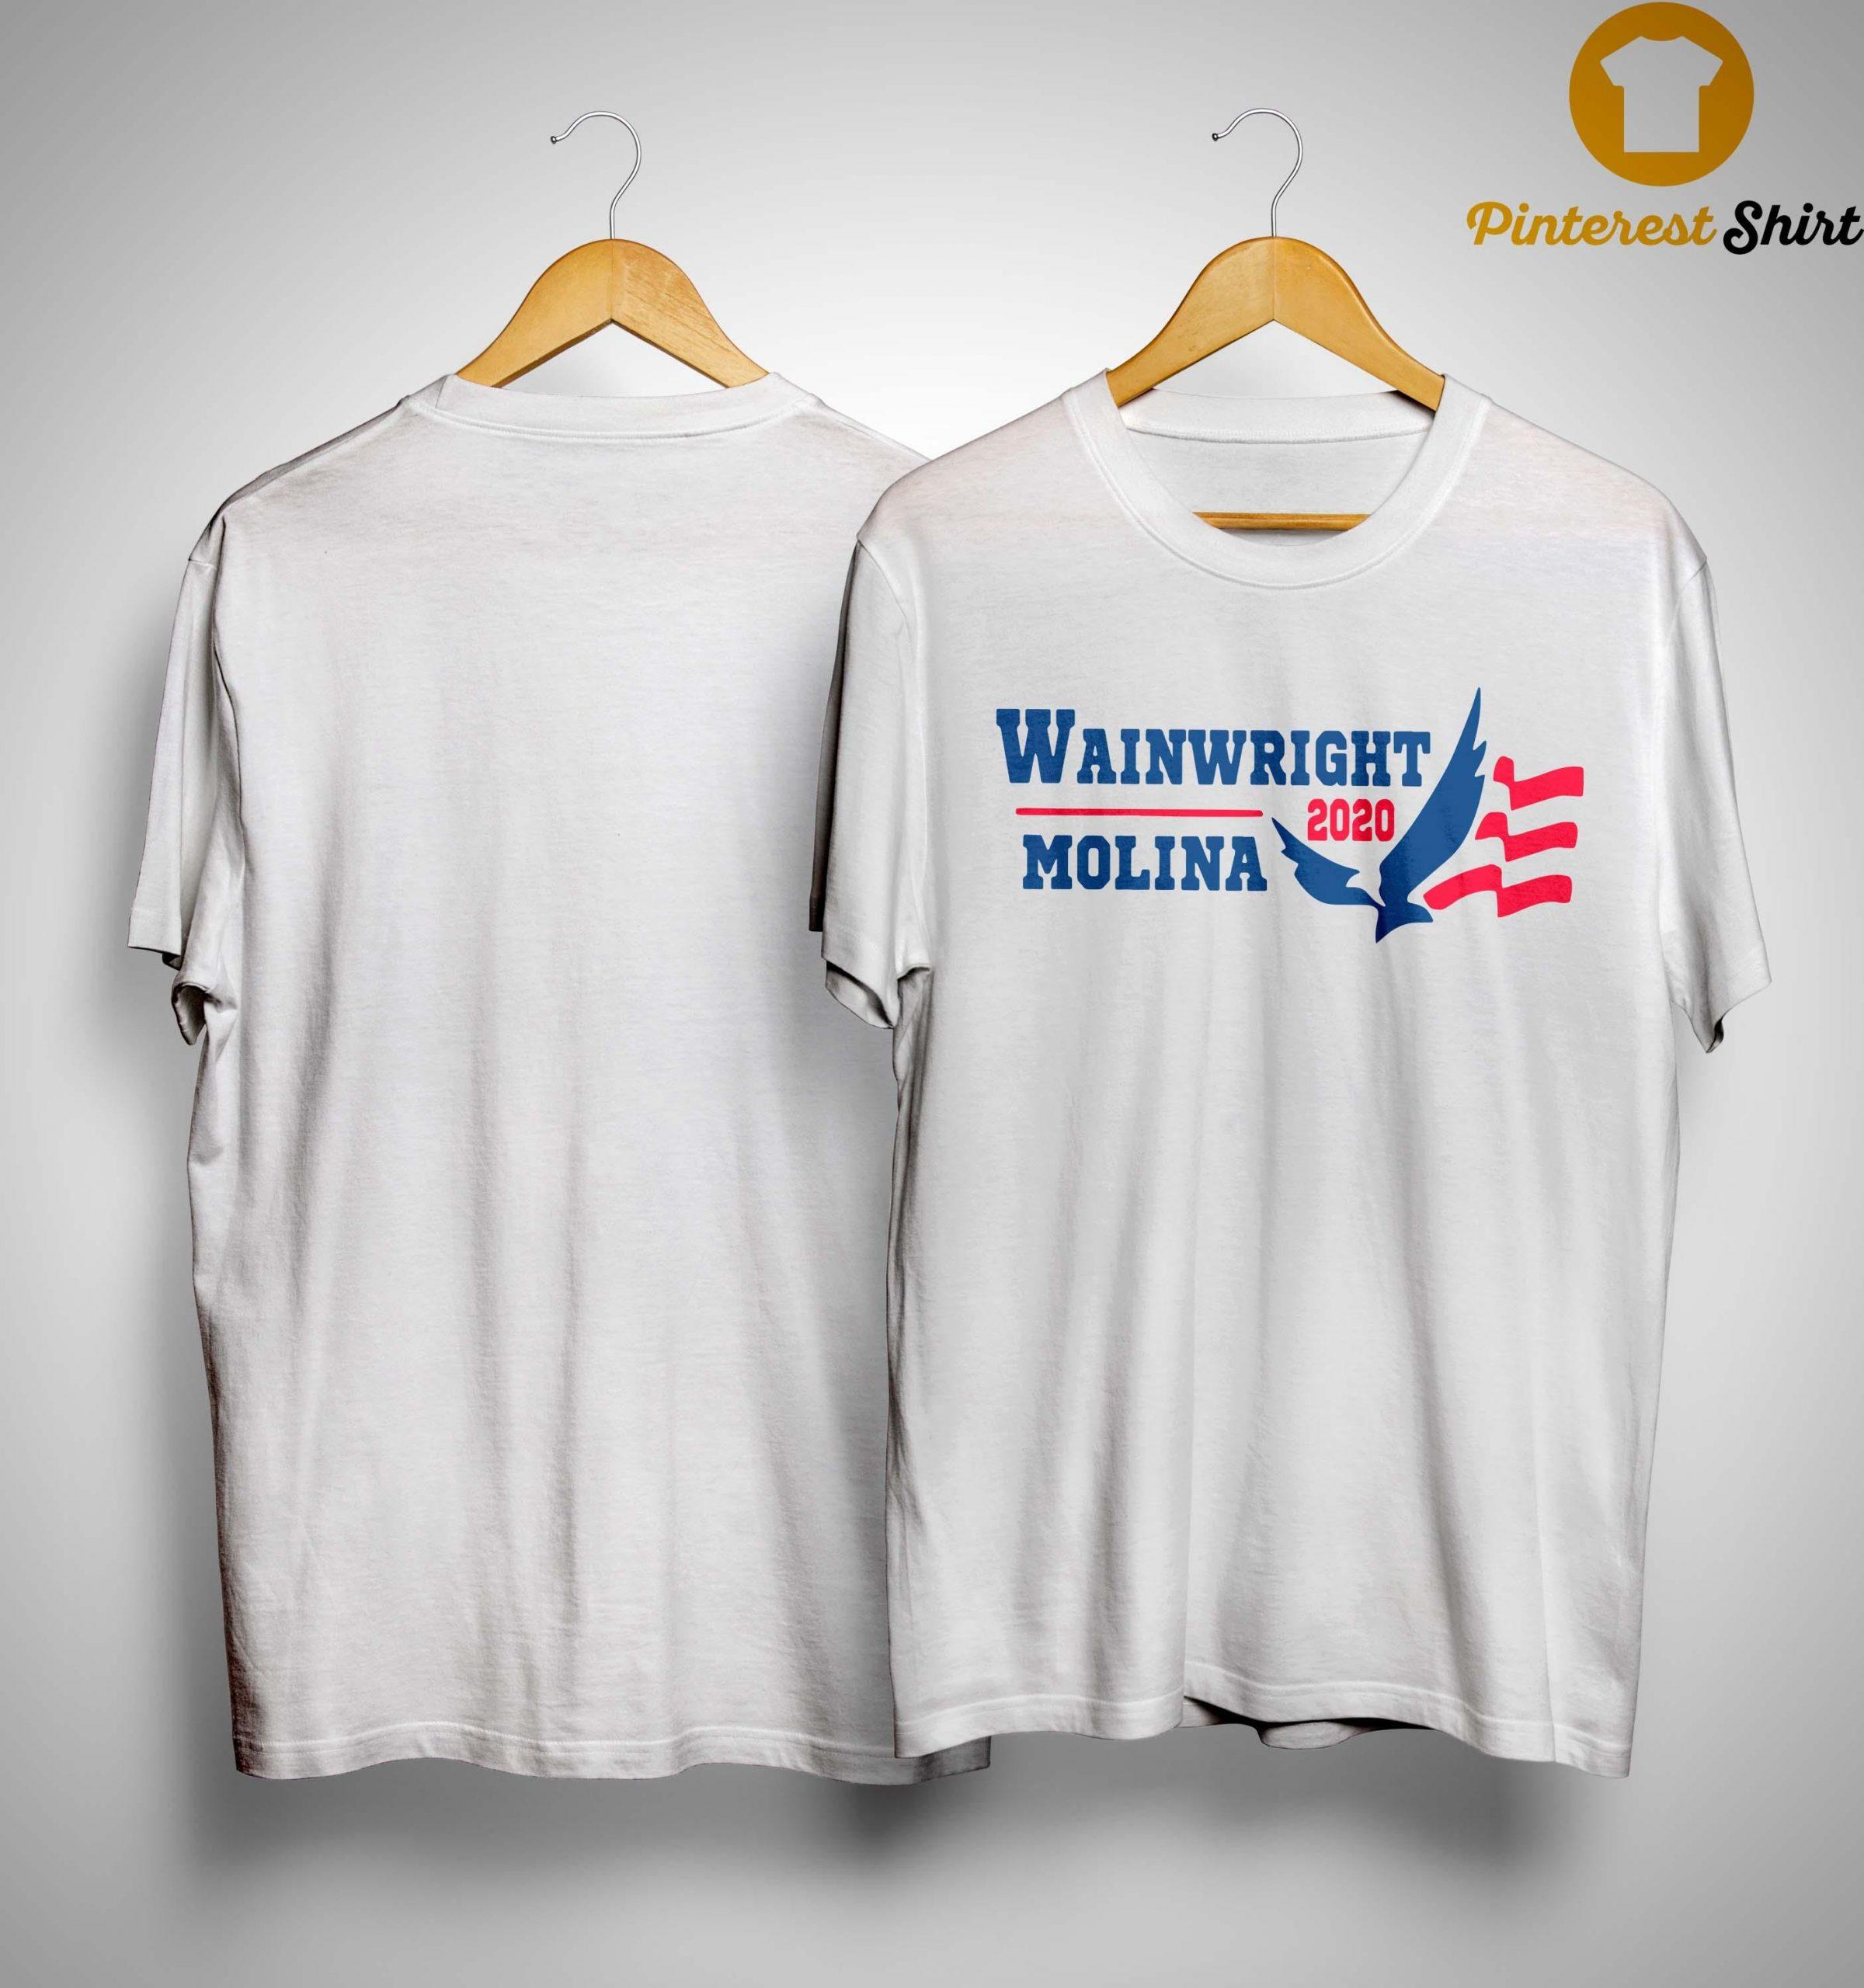 Wainwright Molina 2020 T Shirt